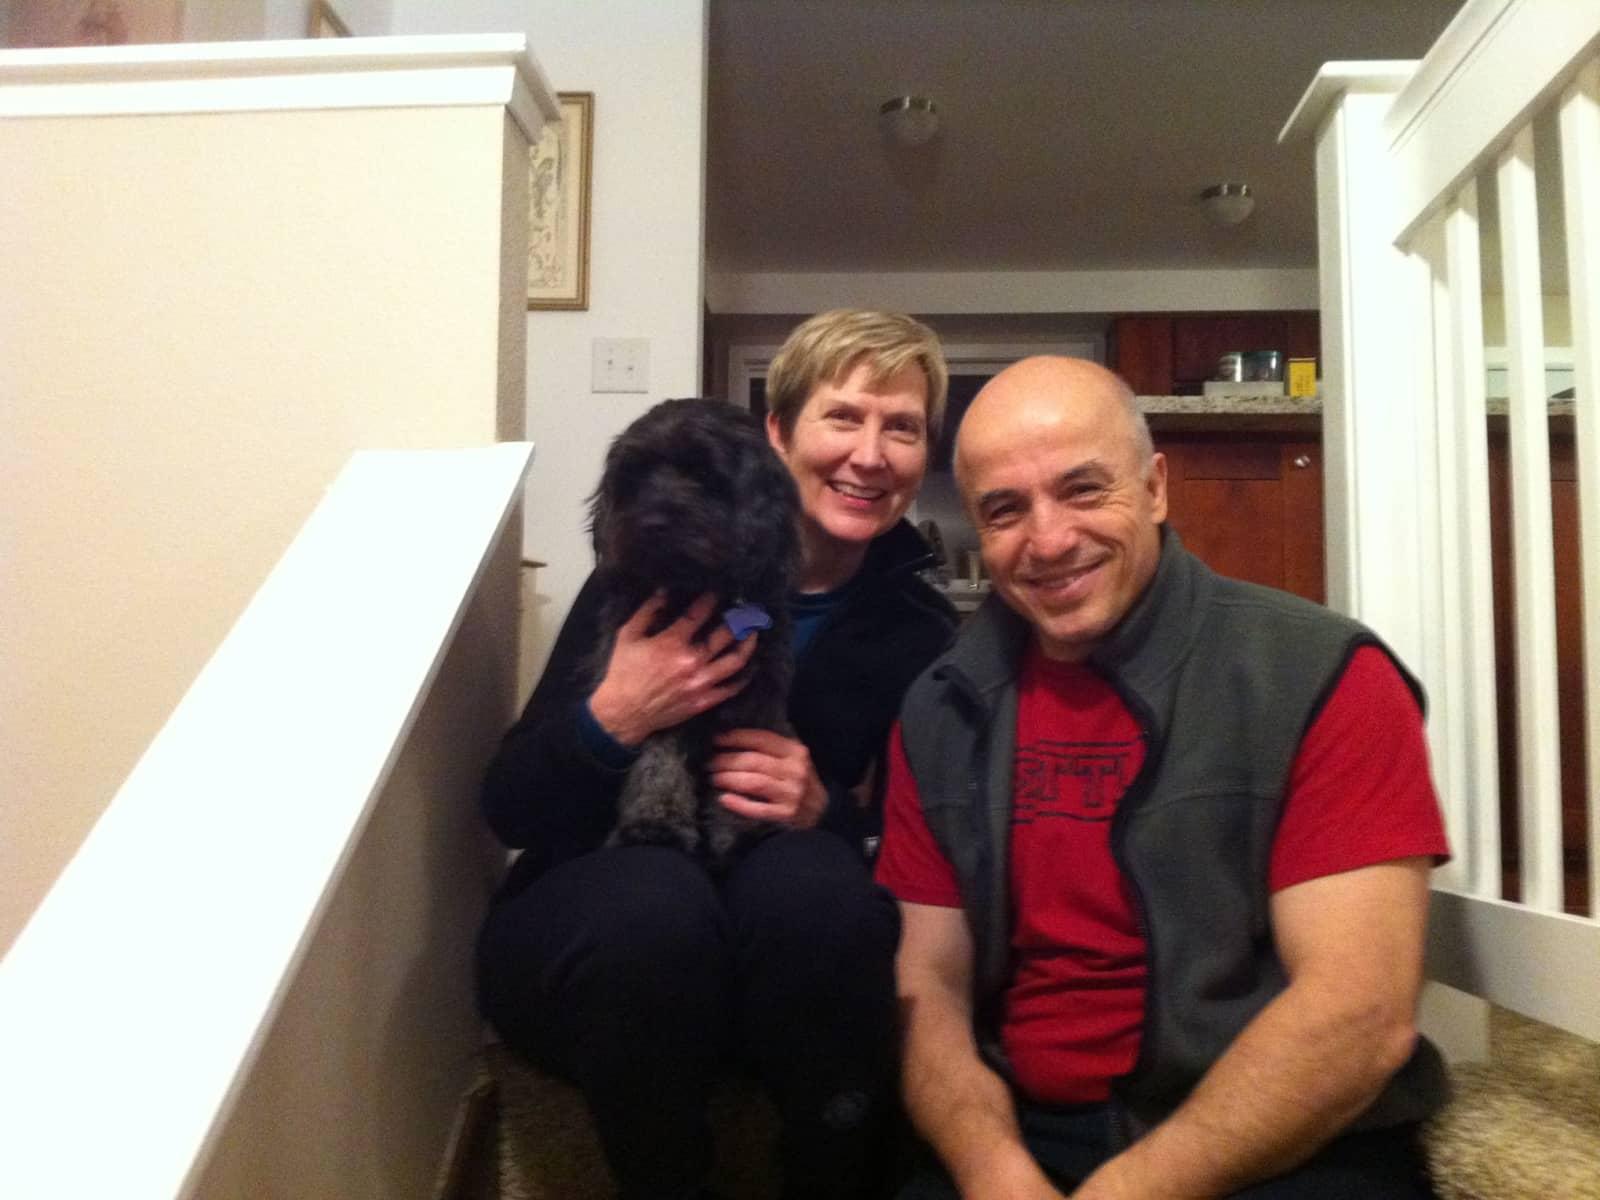 Nancy & Erden from Seattle, Washington, United States